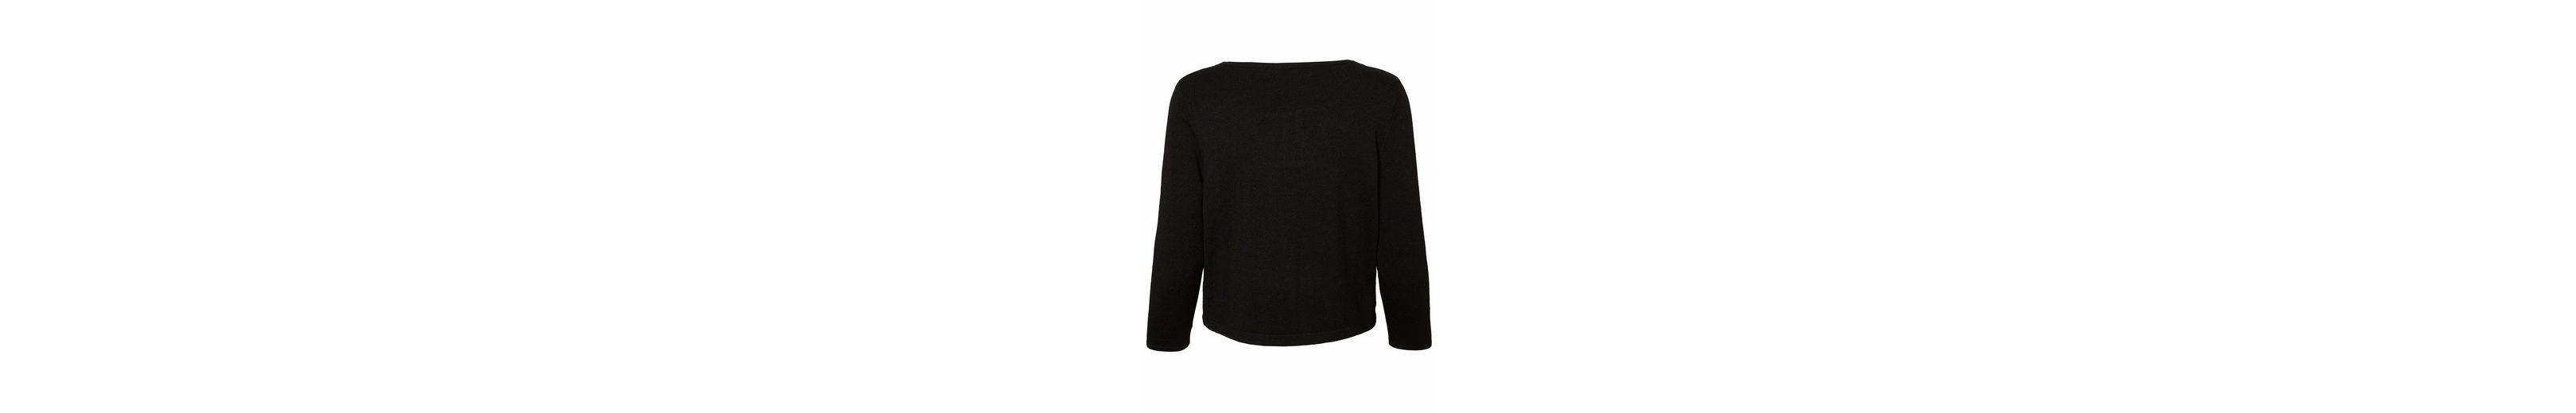 Vero Moda Strickjacke DINAM Auslass Perfekt Günstig Kaufen 100% Garantiert  Wie Viel pdqhUcJiKi